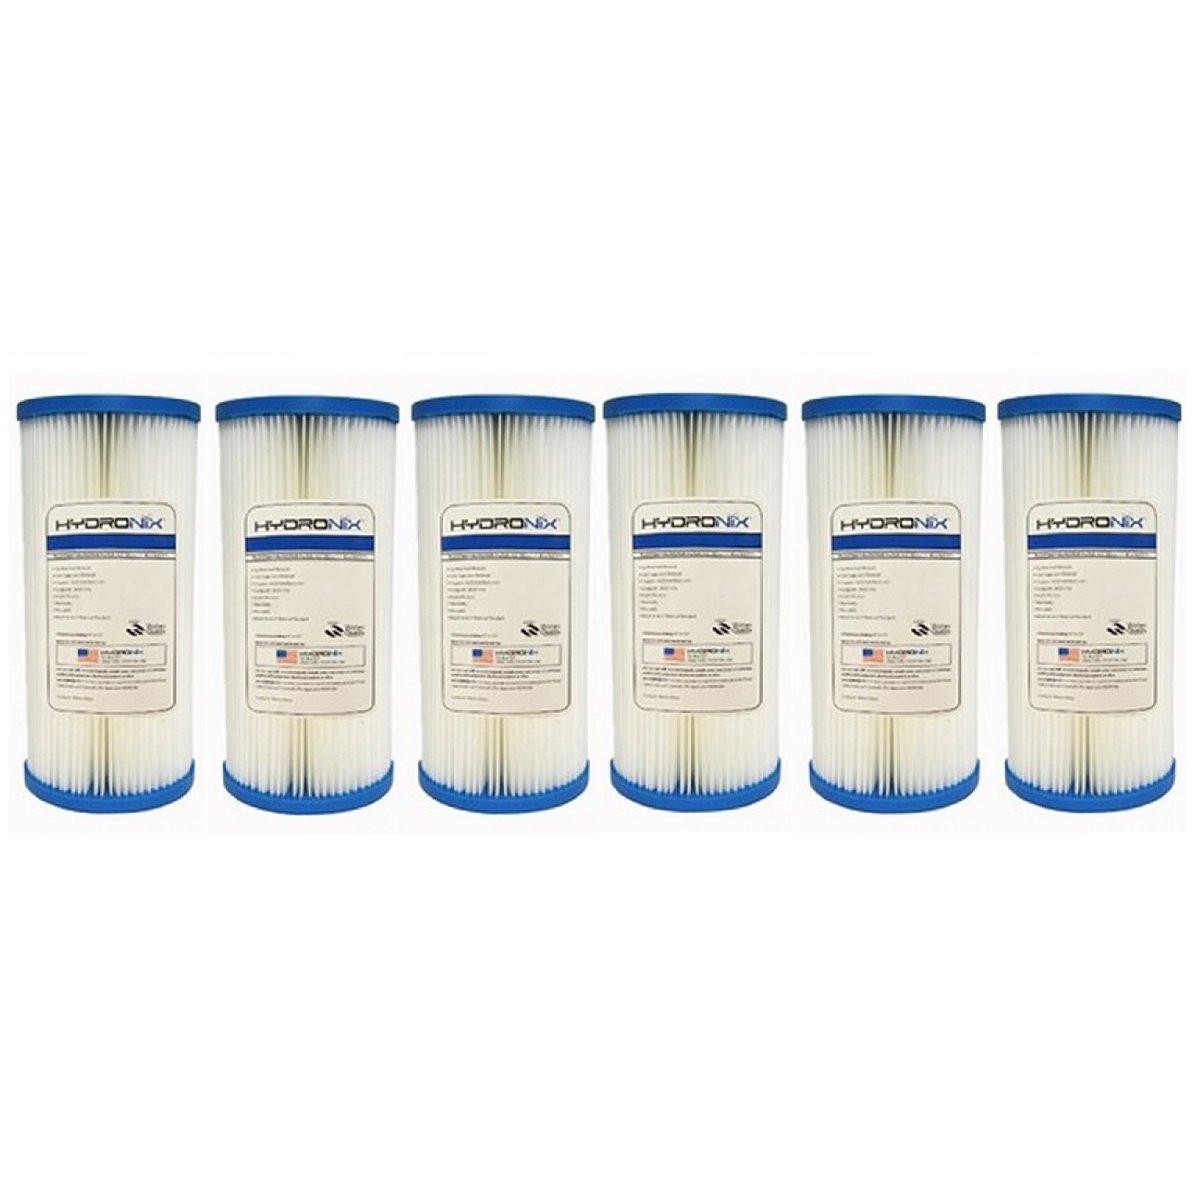 Hydronix HYDRONIX_SPC_45_1005_6_PACK Pentek ECP5-BB 5 Micron Whole House Sediment Filter 6 Pack, Single Unit